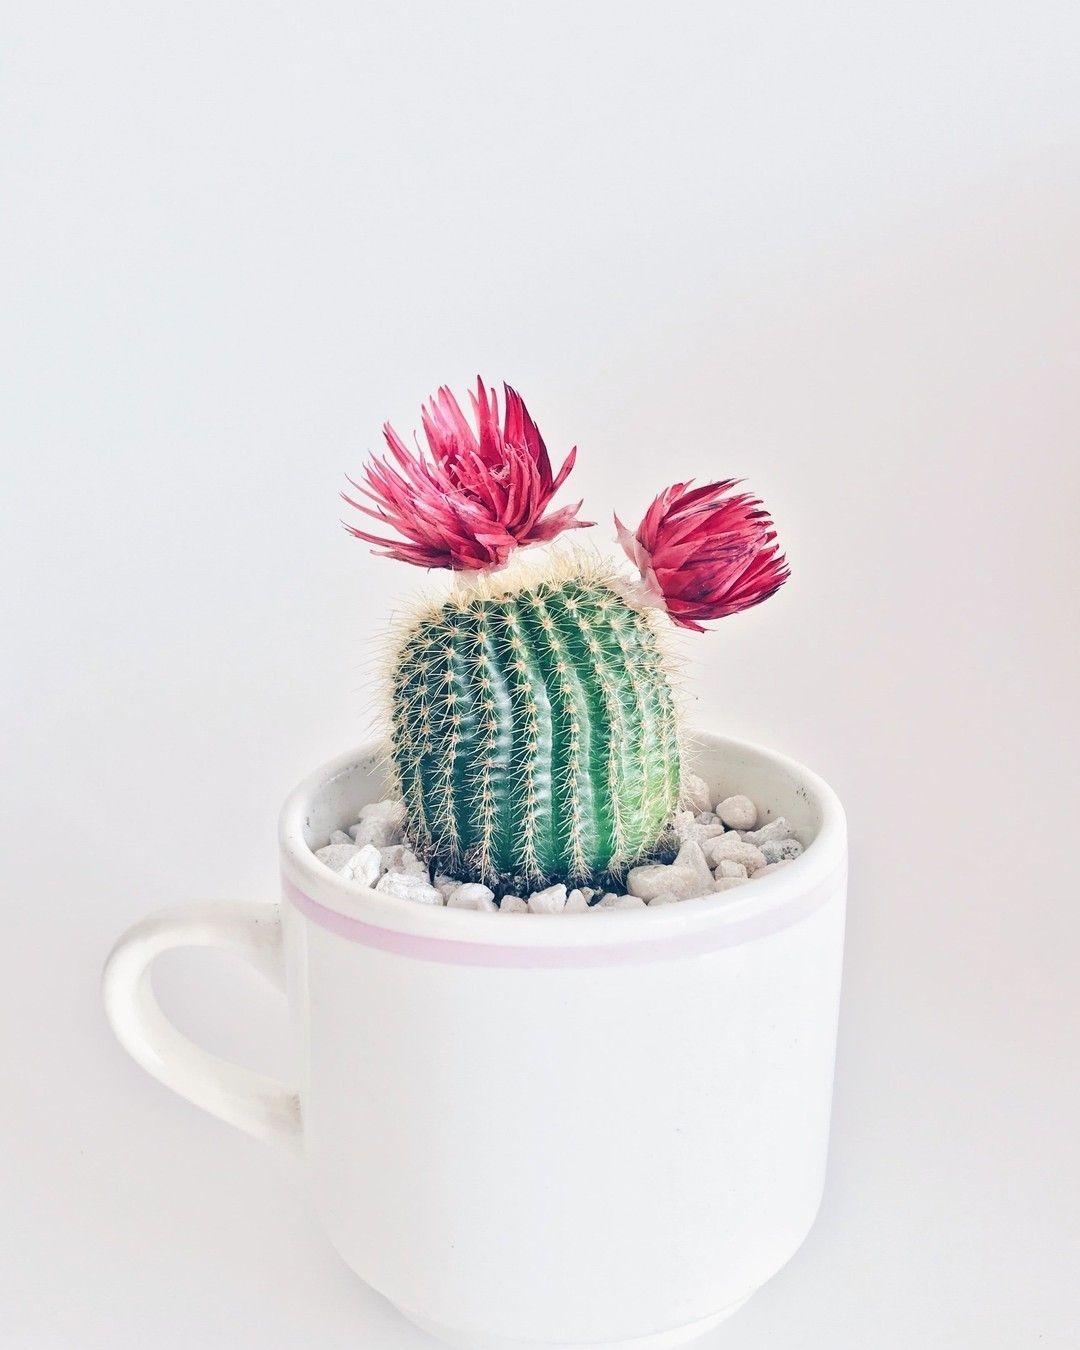 Wonderful Cactus Centerpieces Ideas32